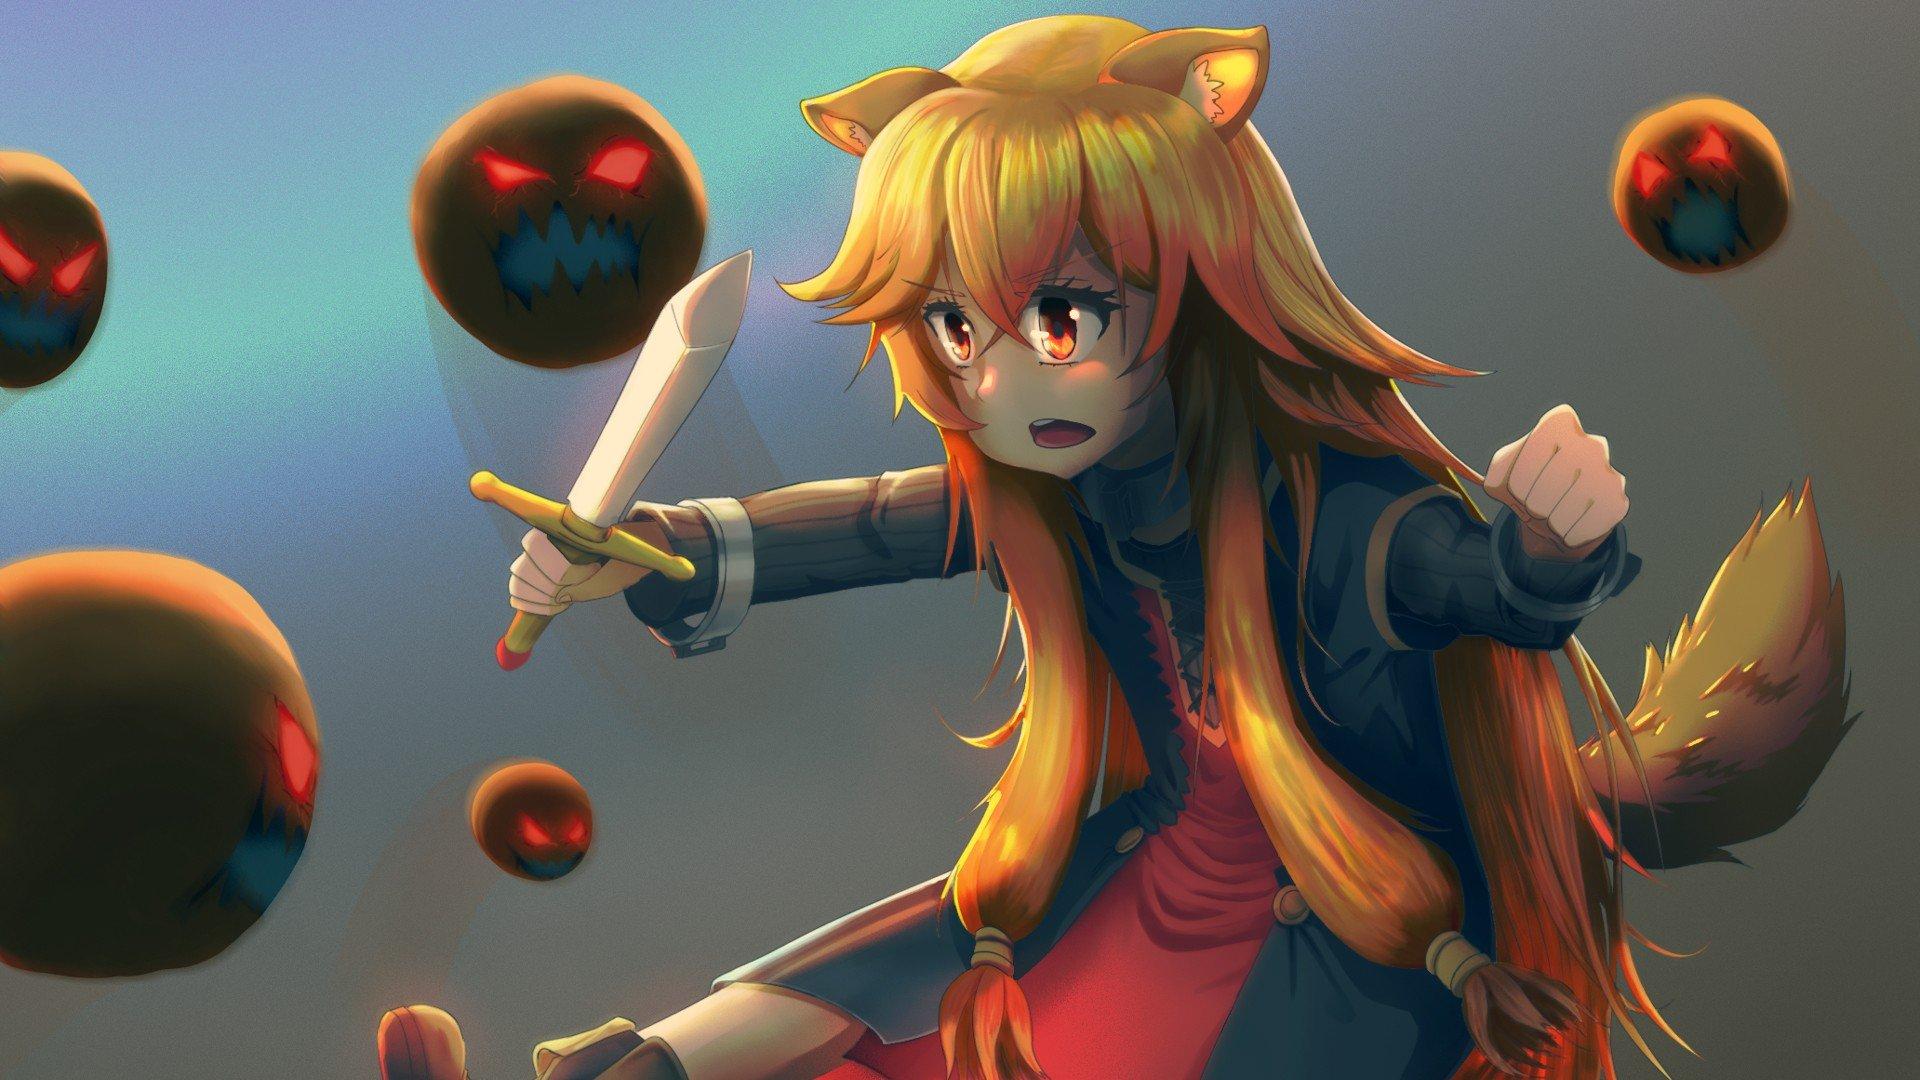 Fondos de pantalla Anime Raphtalia de El ascenso del Heroe del Escudo